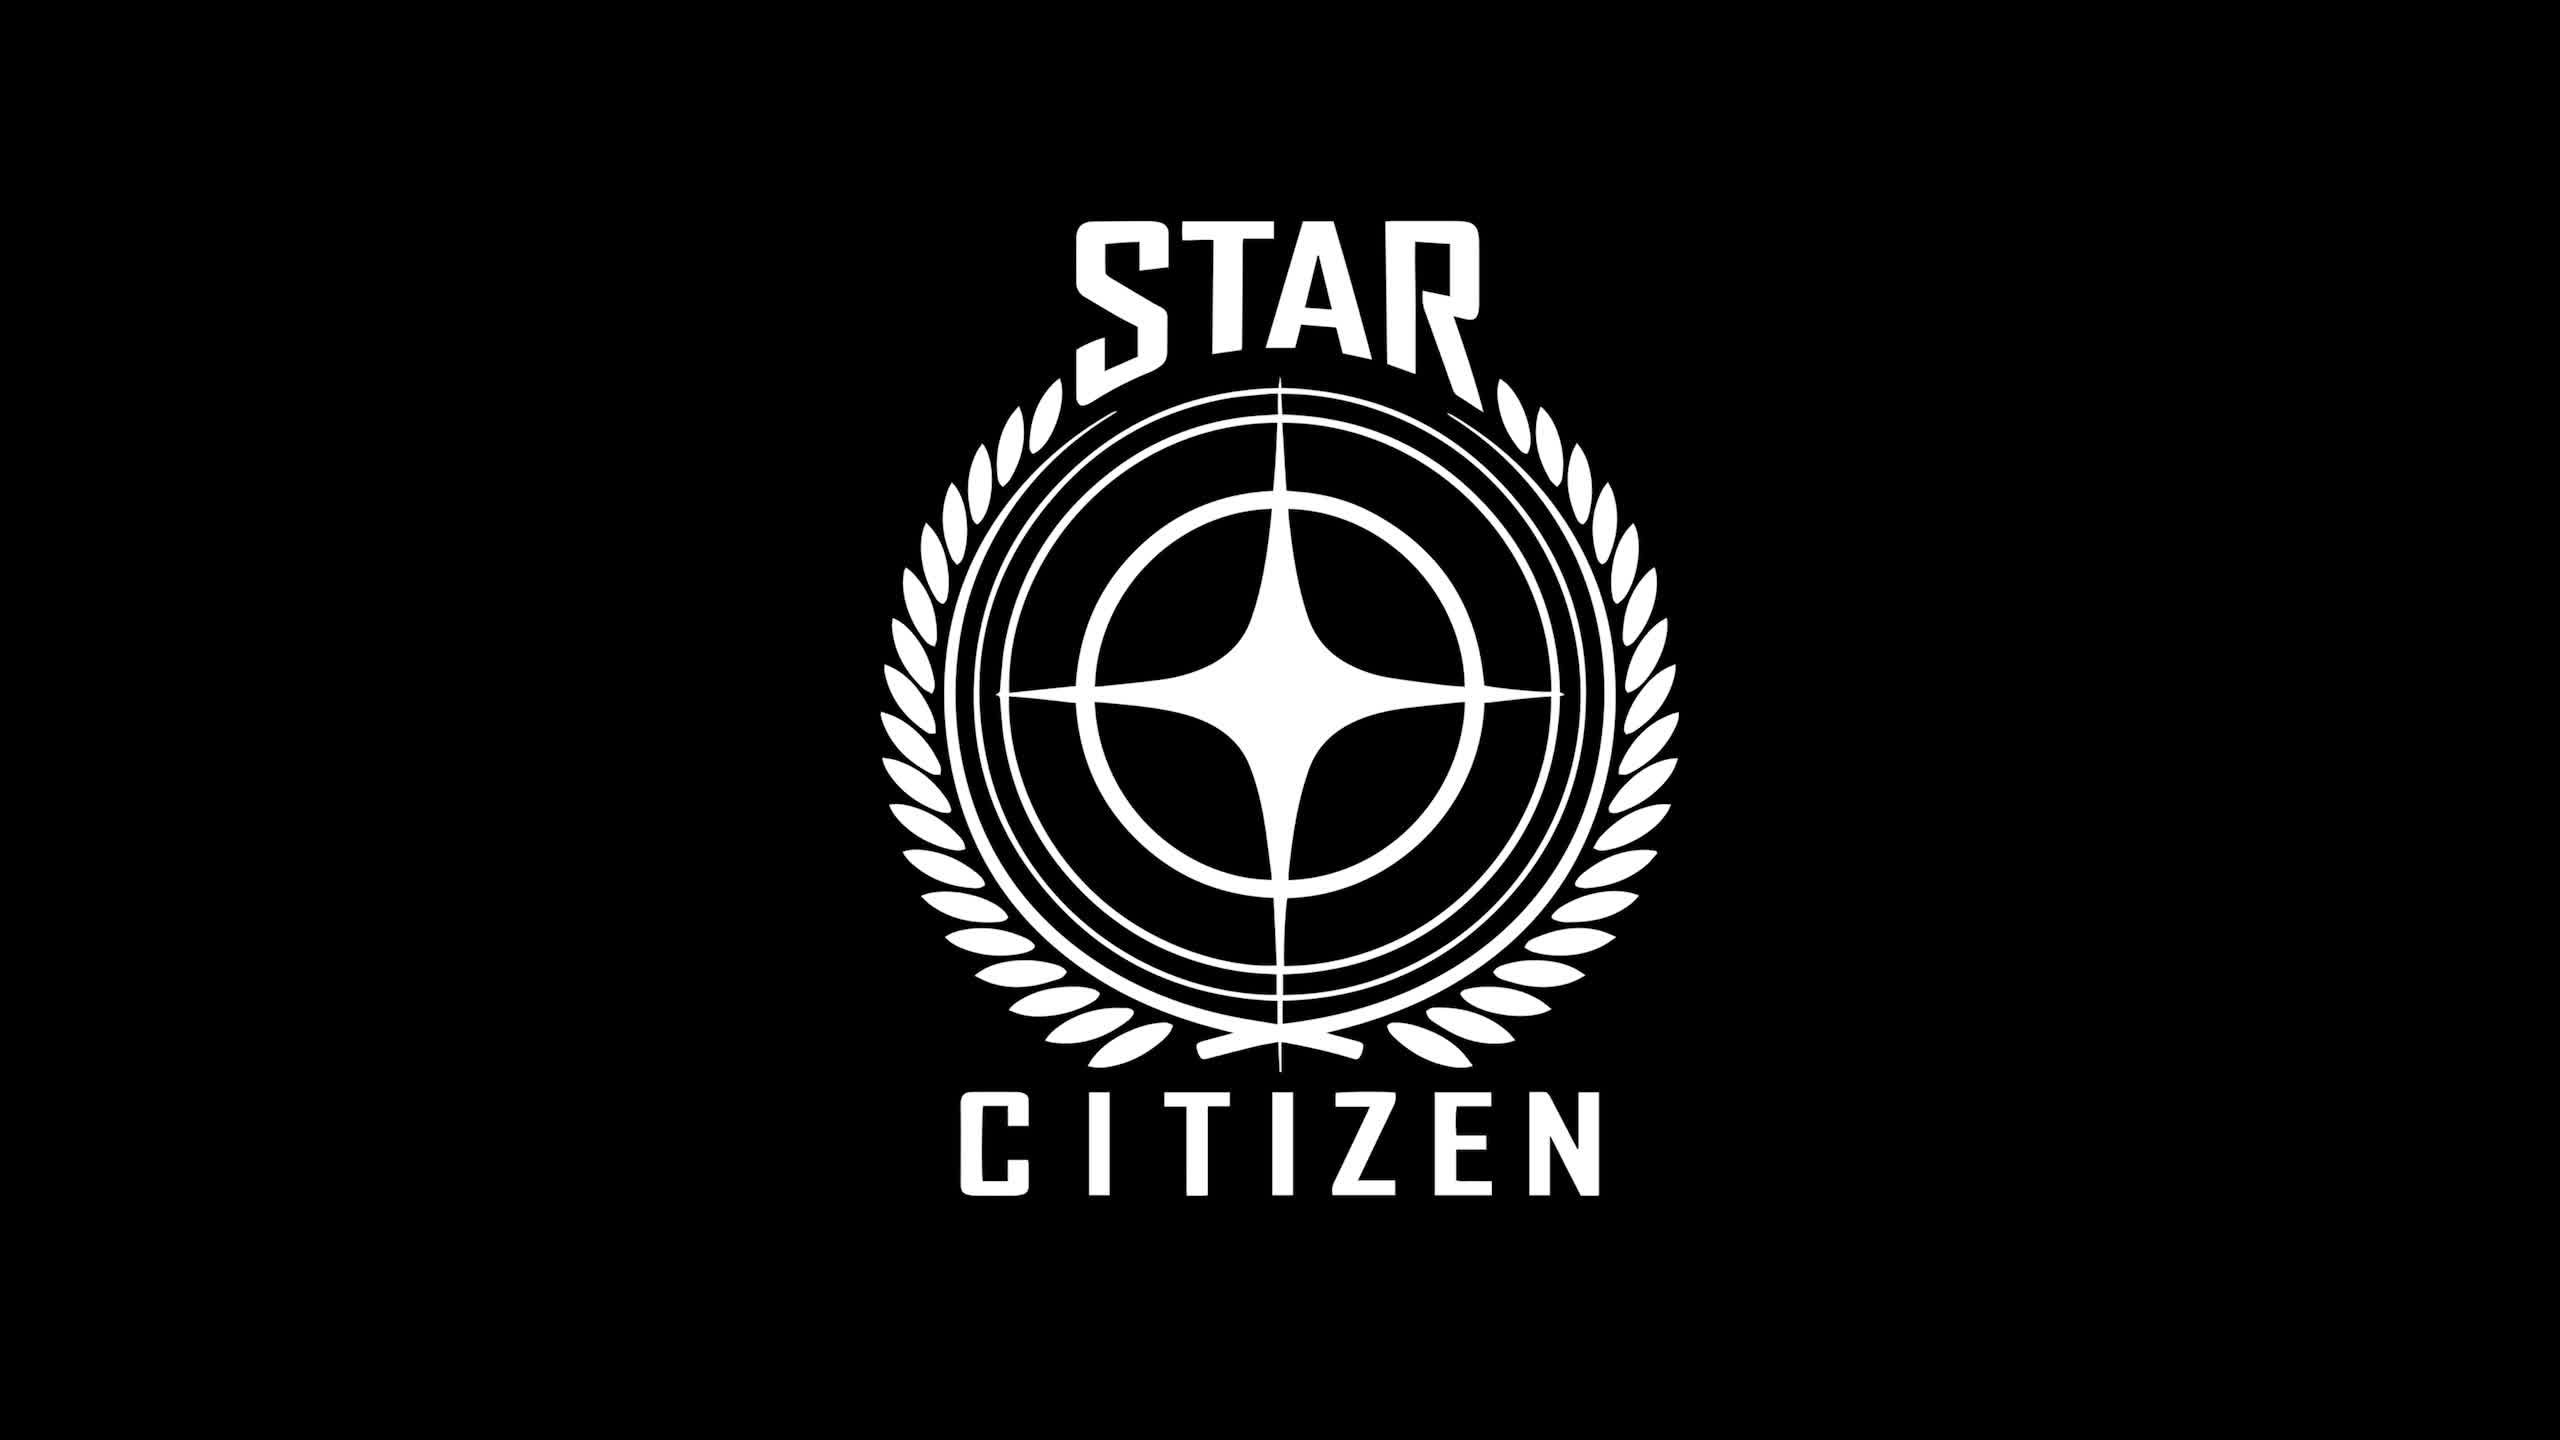 starcitizen, Seuss Citizen: One Ship Two Ship GIFs